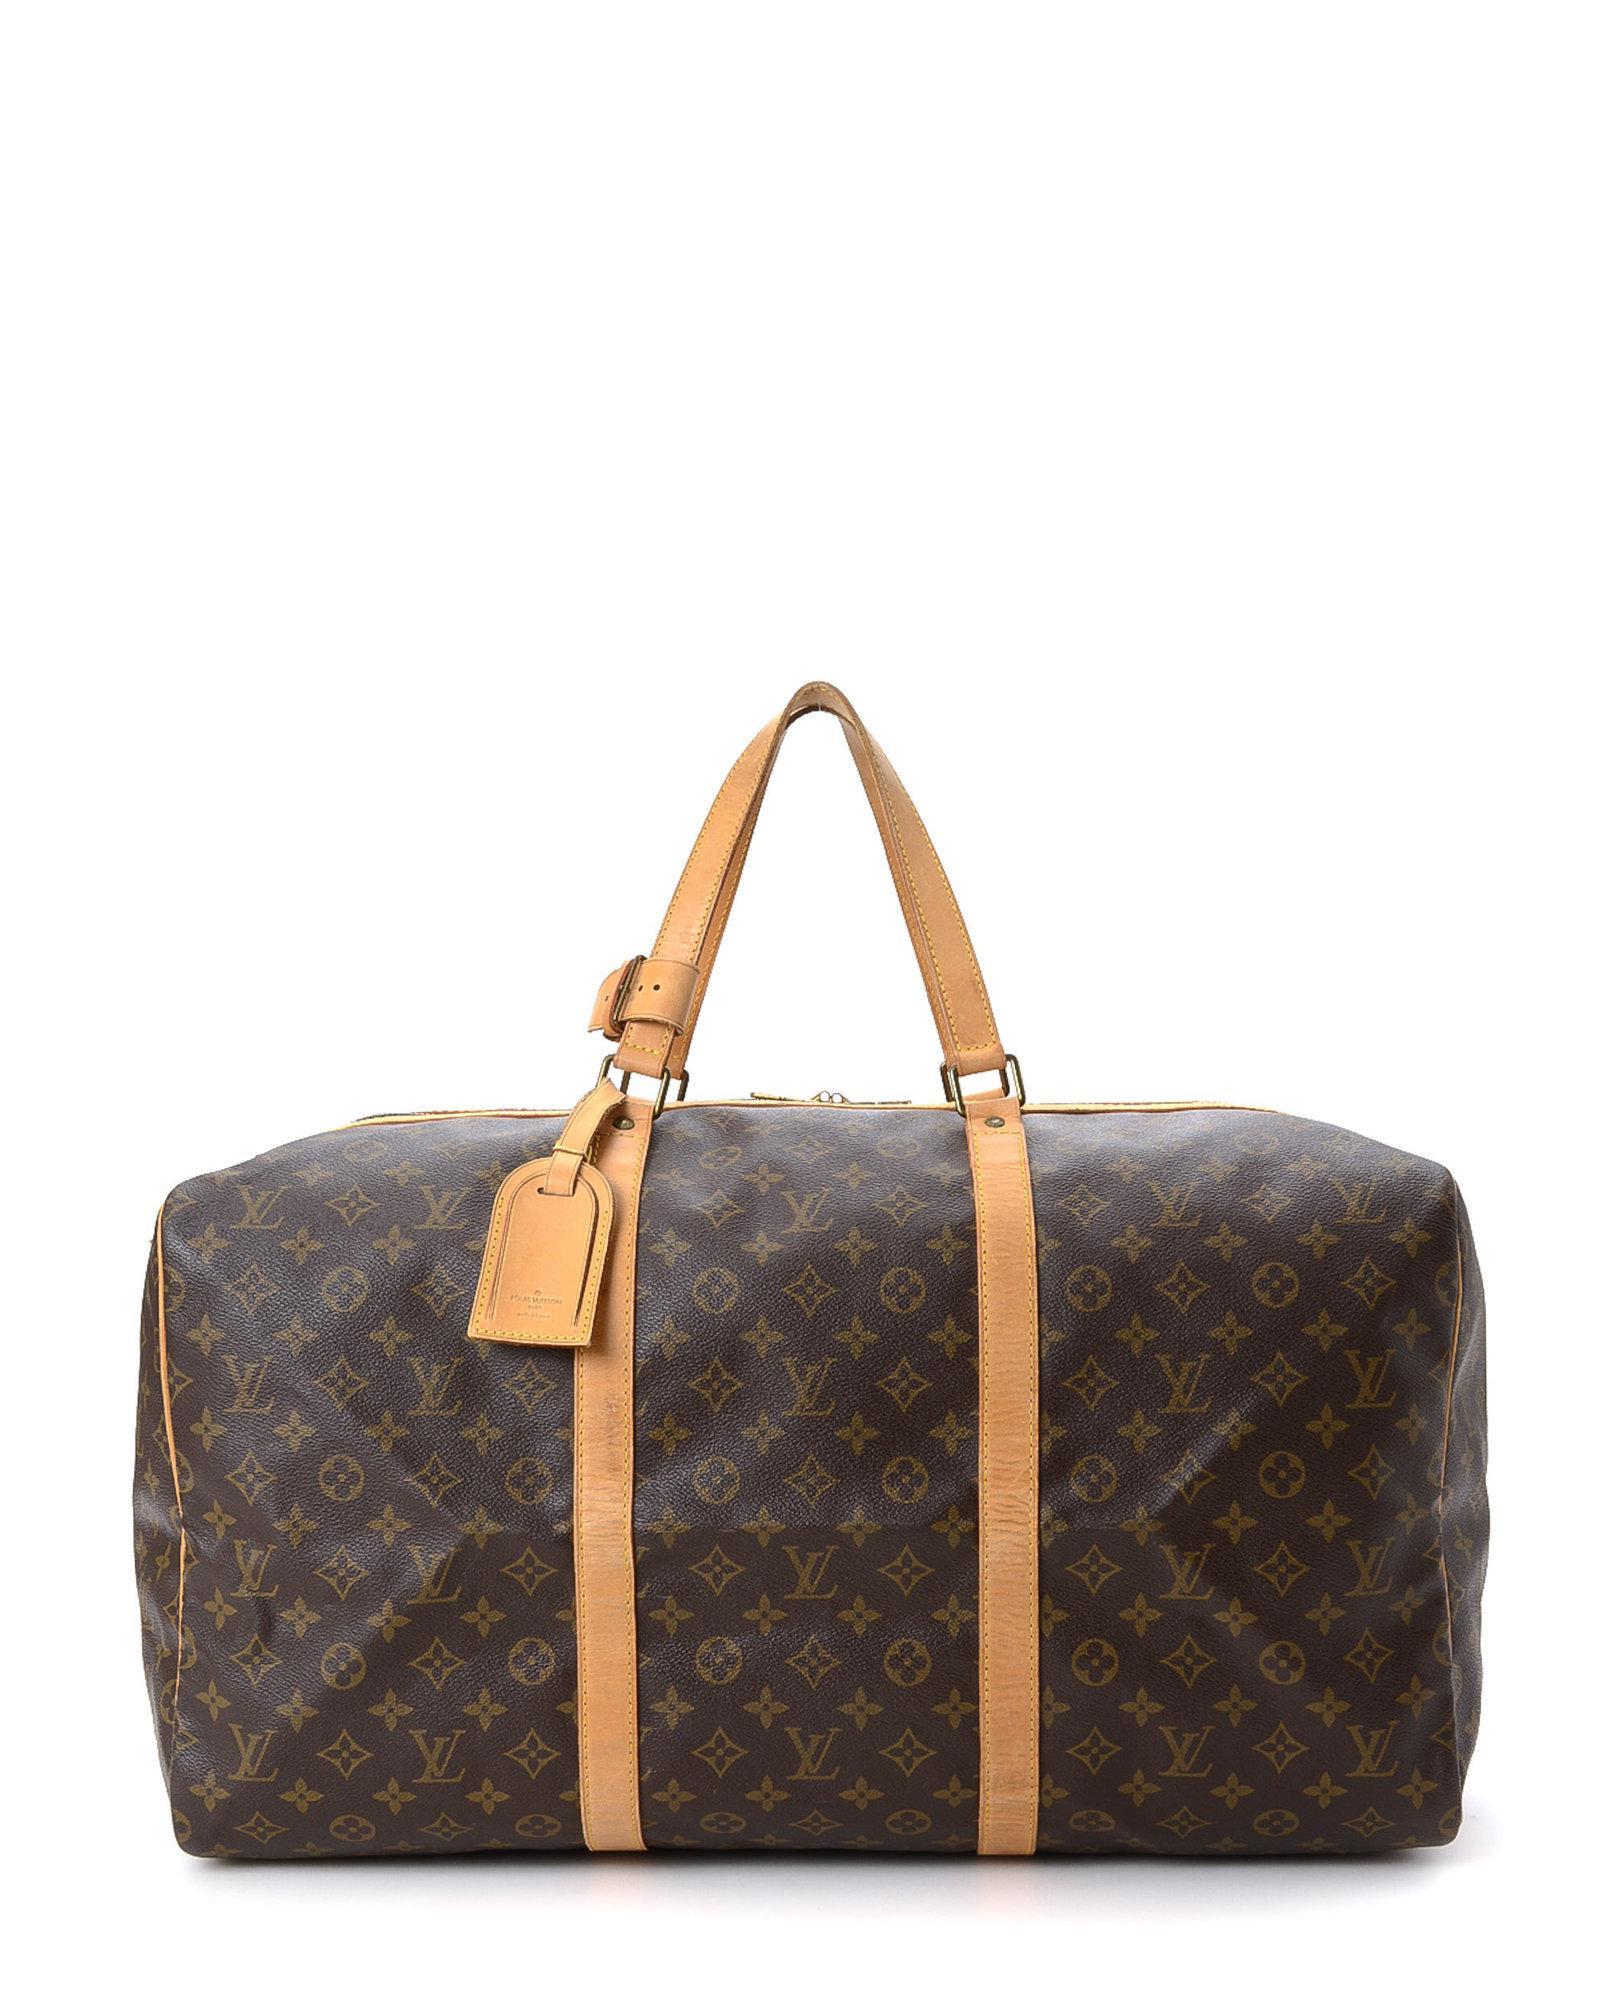 73d7a0a455b Lyst - Louis Vuitton Sac Souple 55 Travel Bag - Vintage in Brown